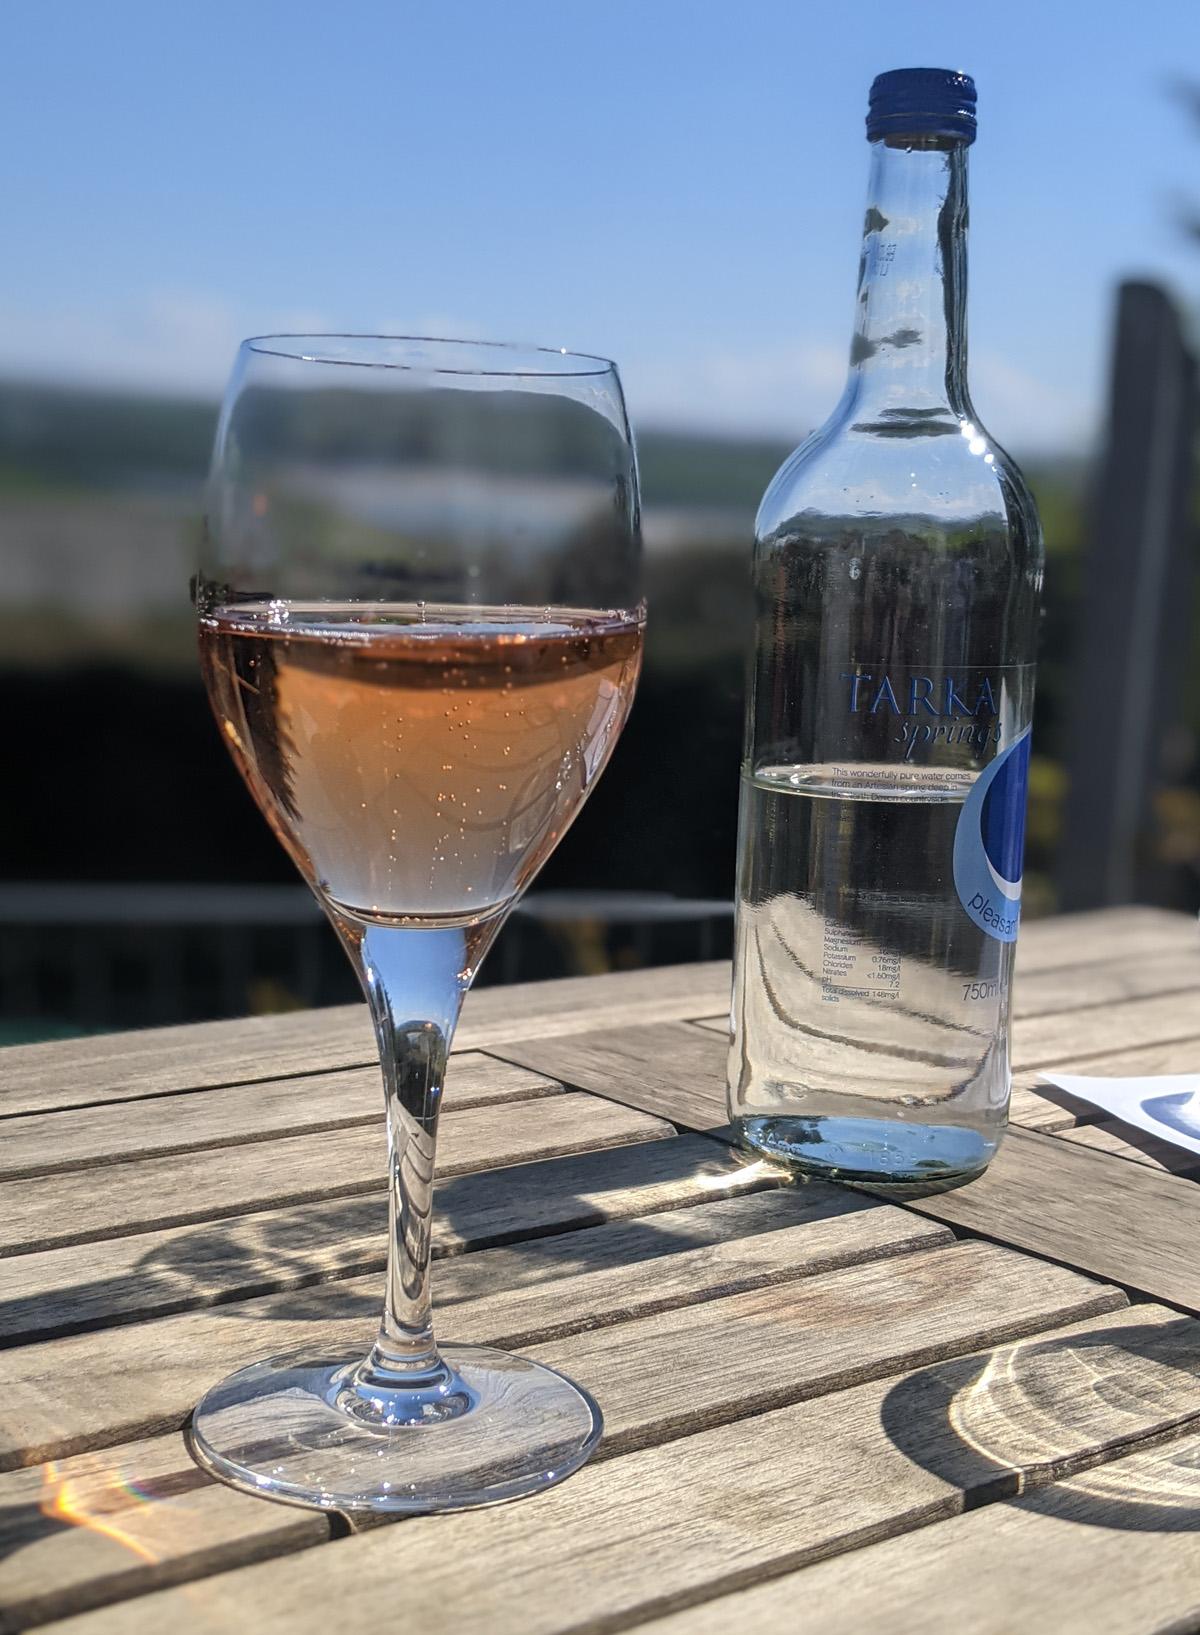 St Enodoc - Pinot Noir Camel Valley